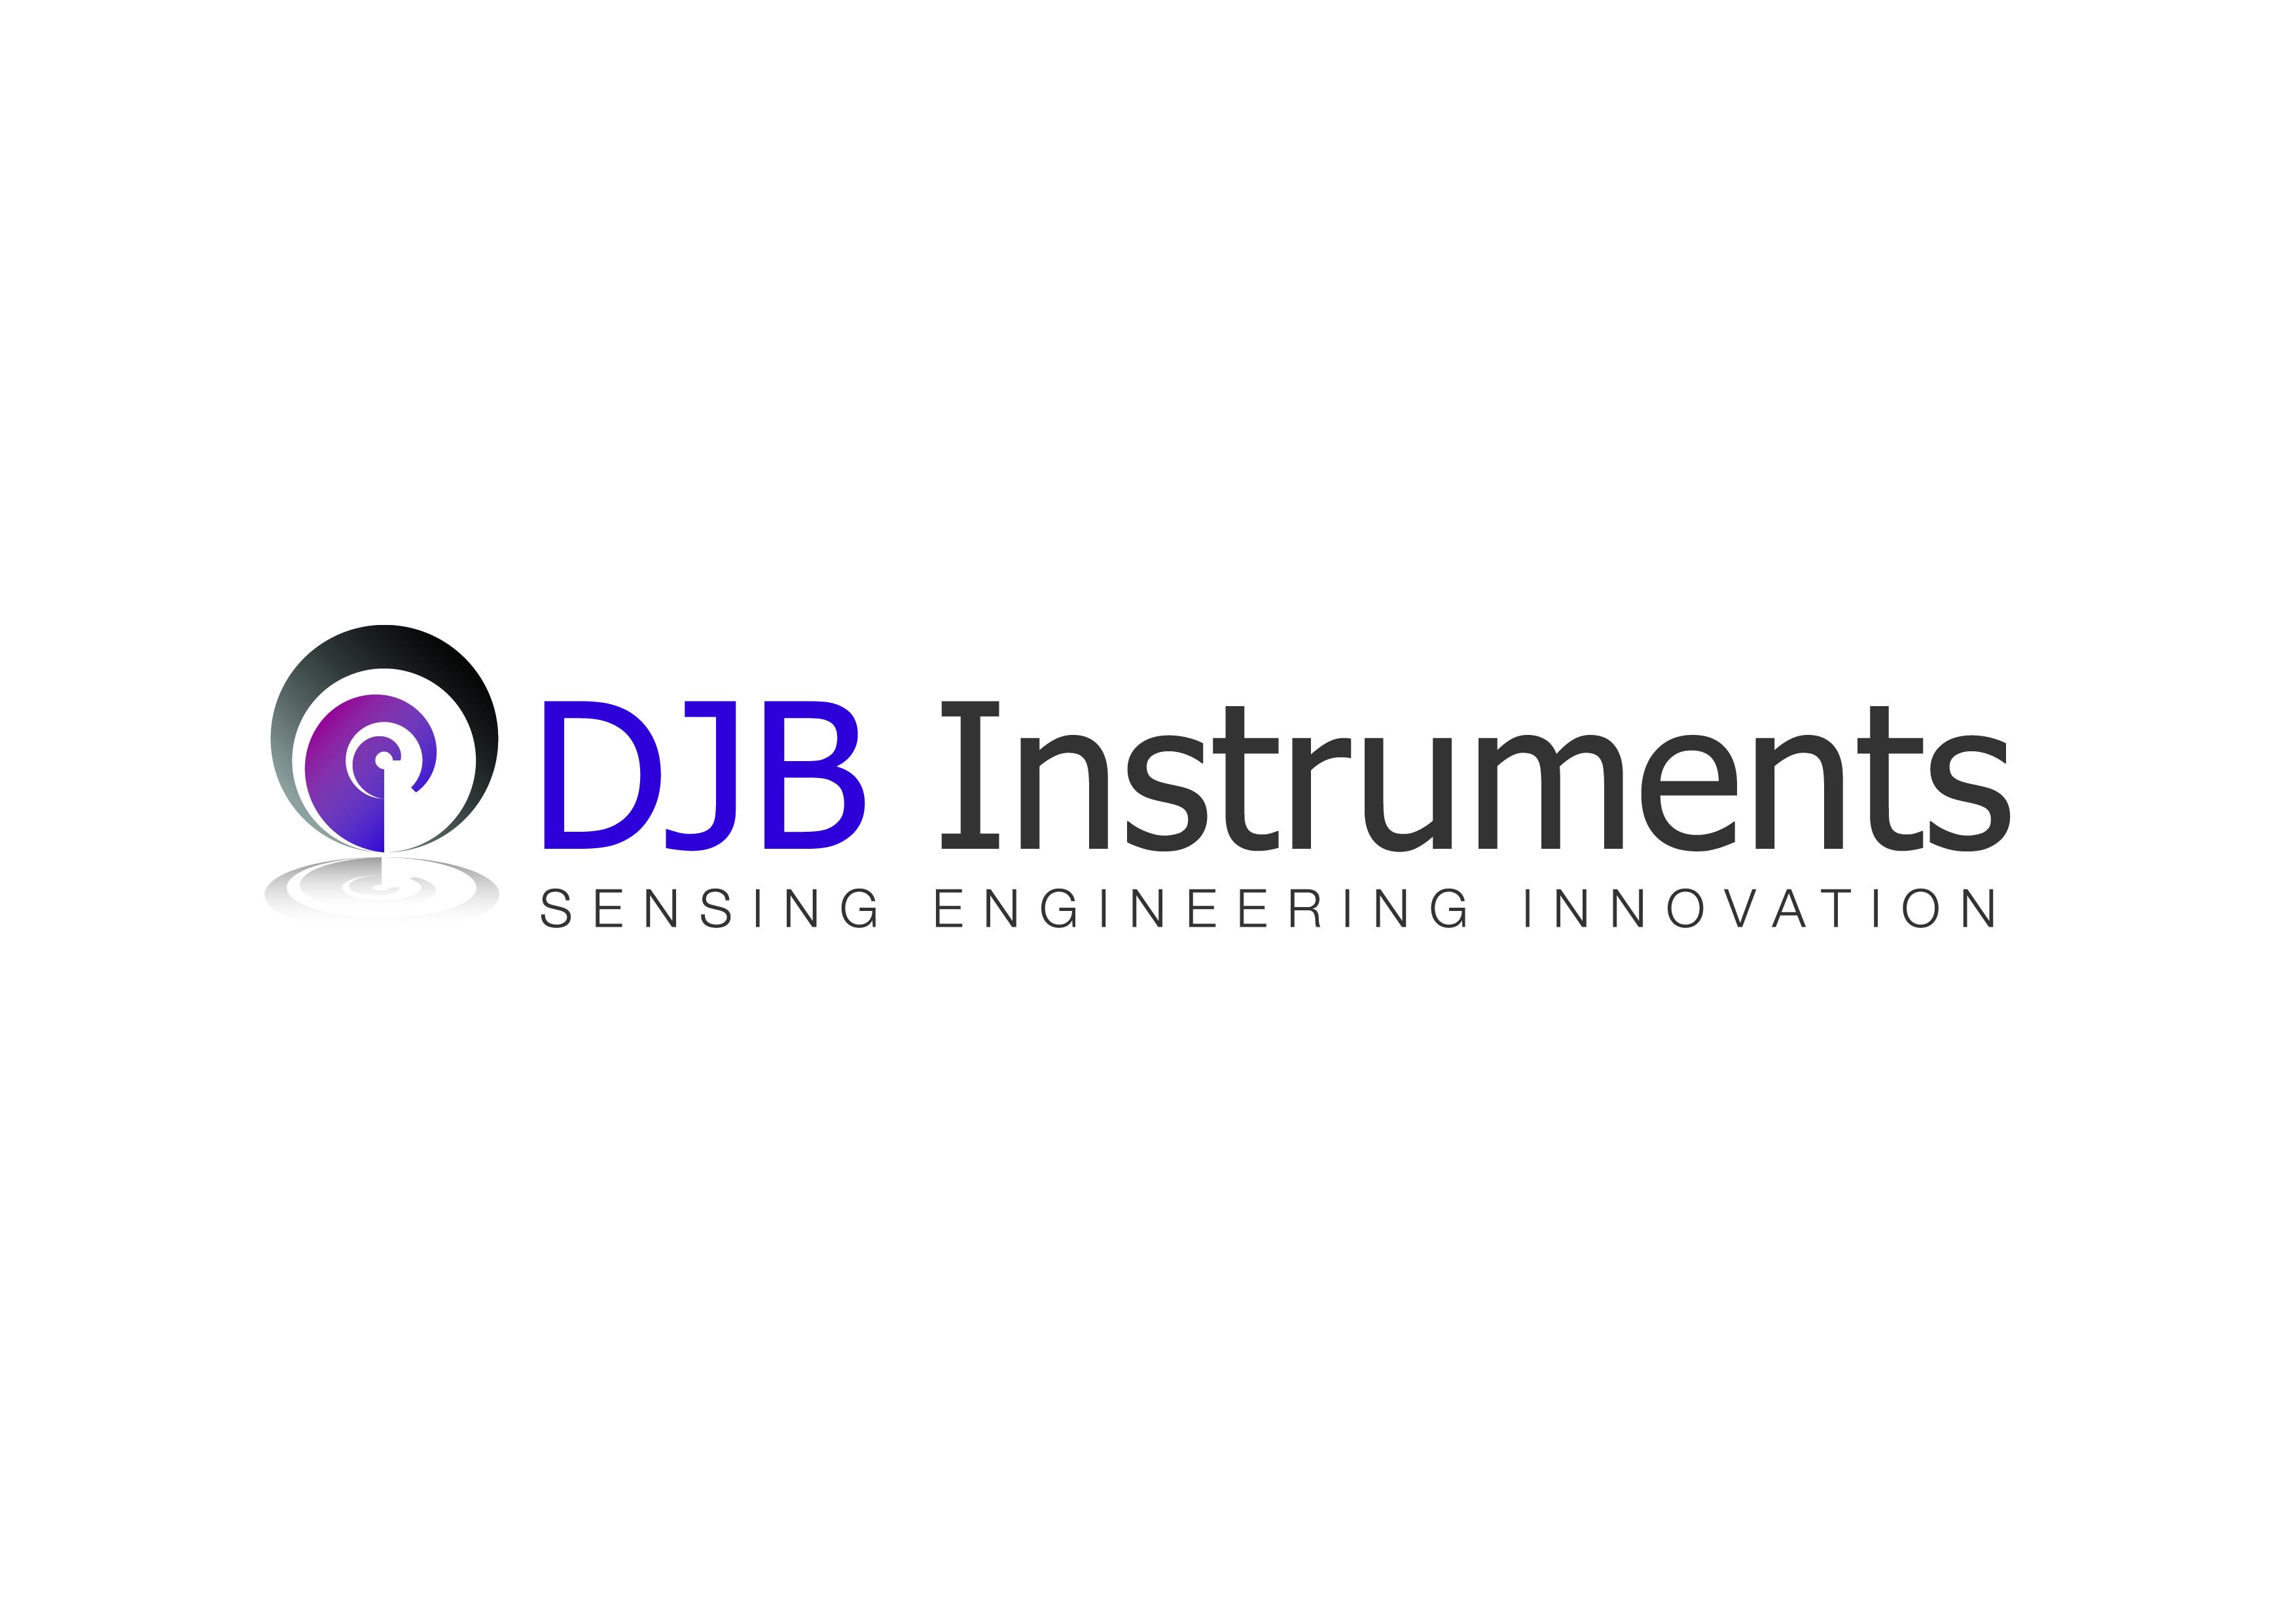 DBJ Instruments